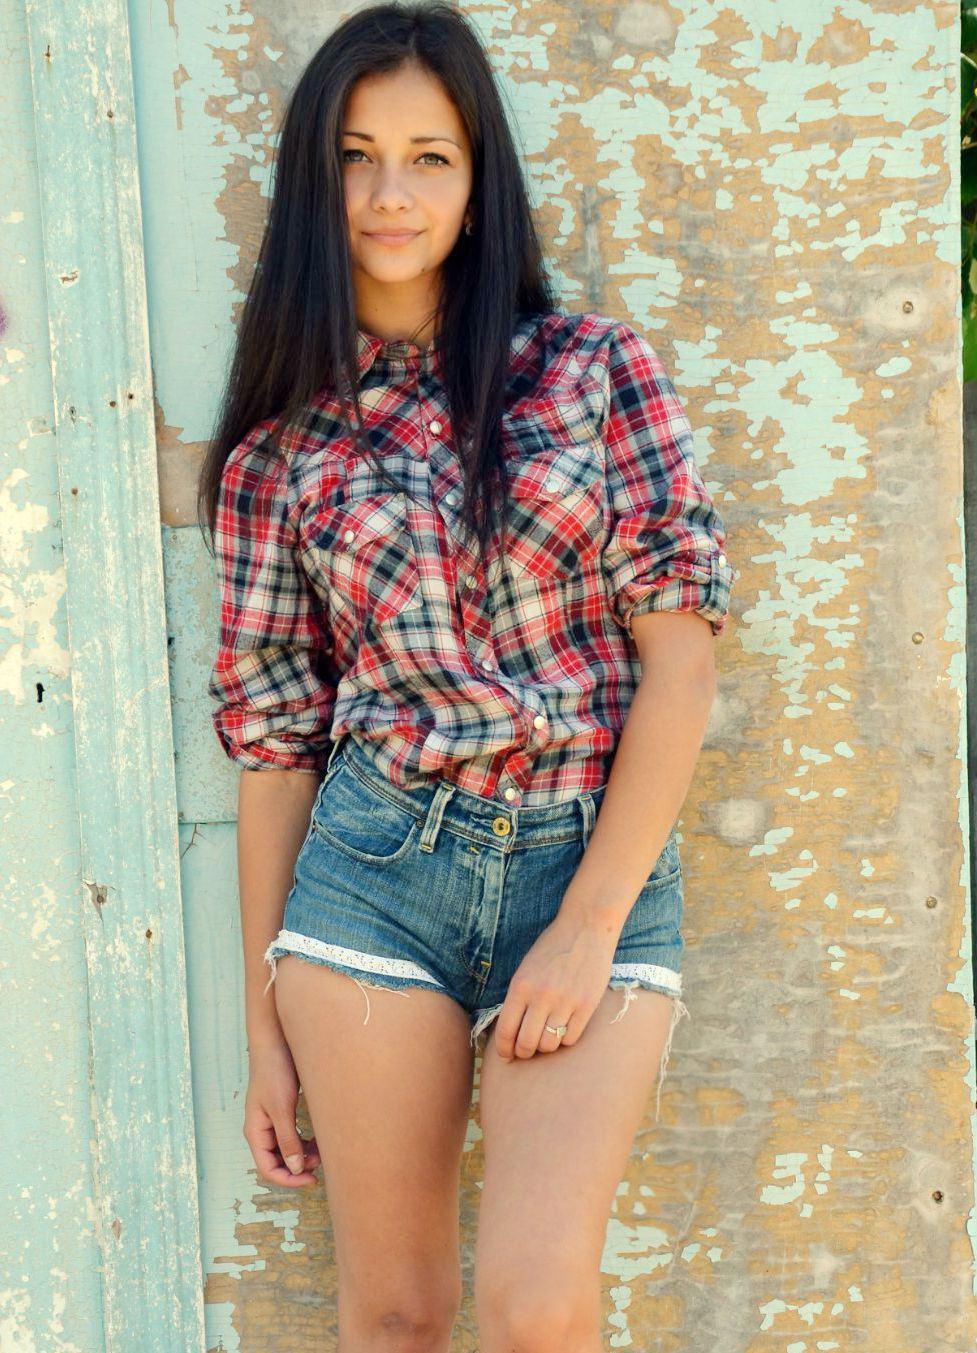 Девочка в шортах фотосет фото 380-478